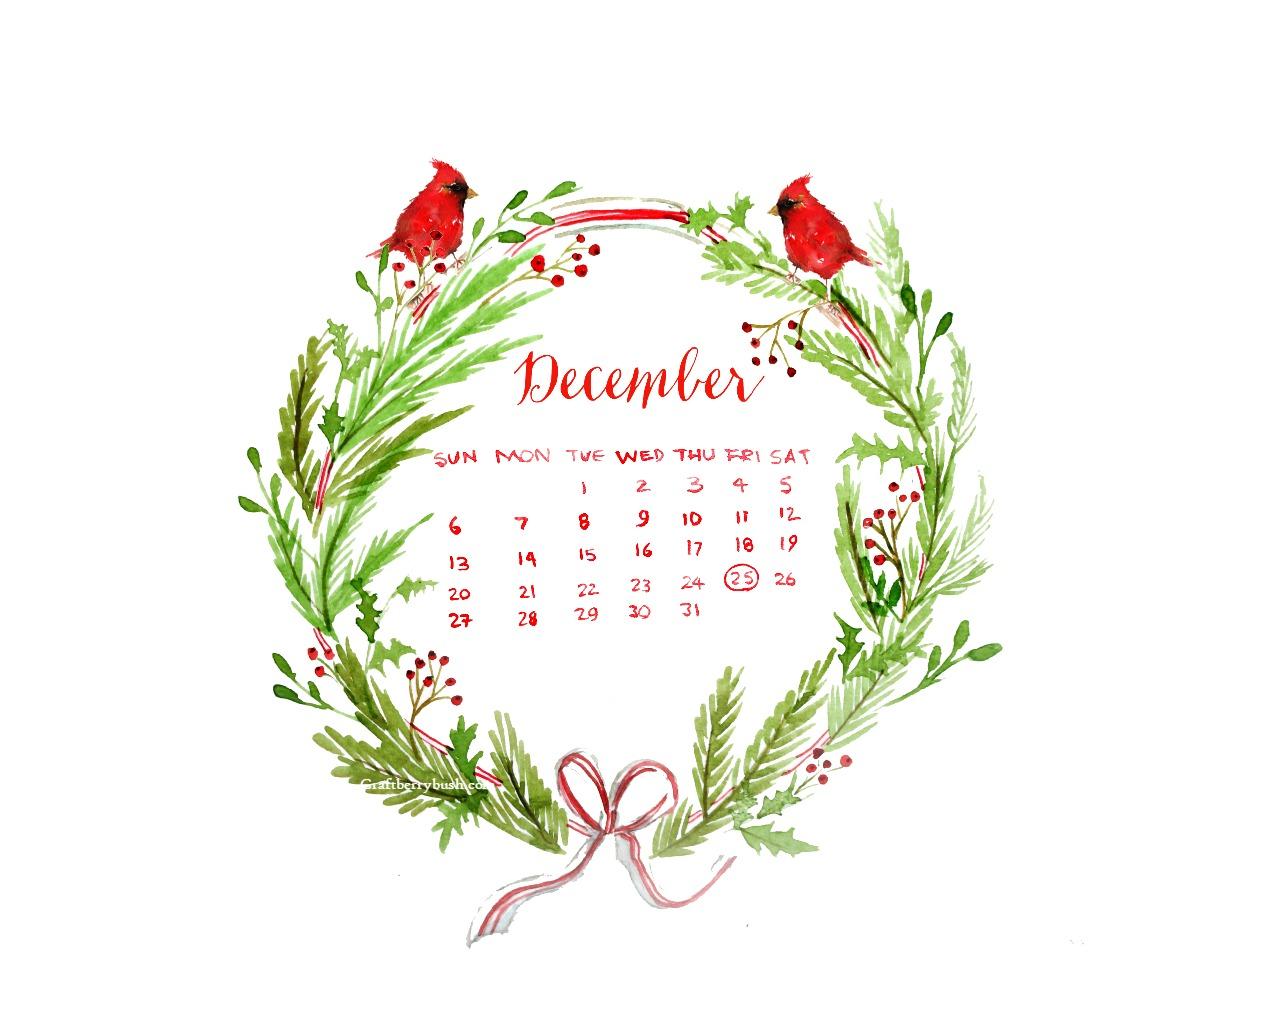 Decembercalendar1280craftberrybush